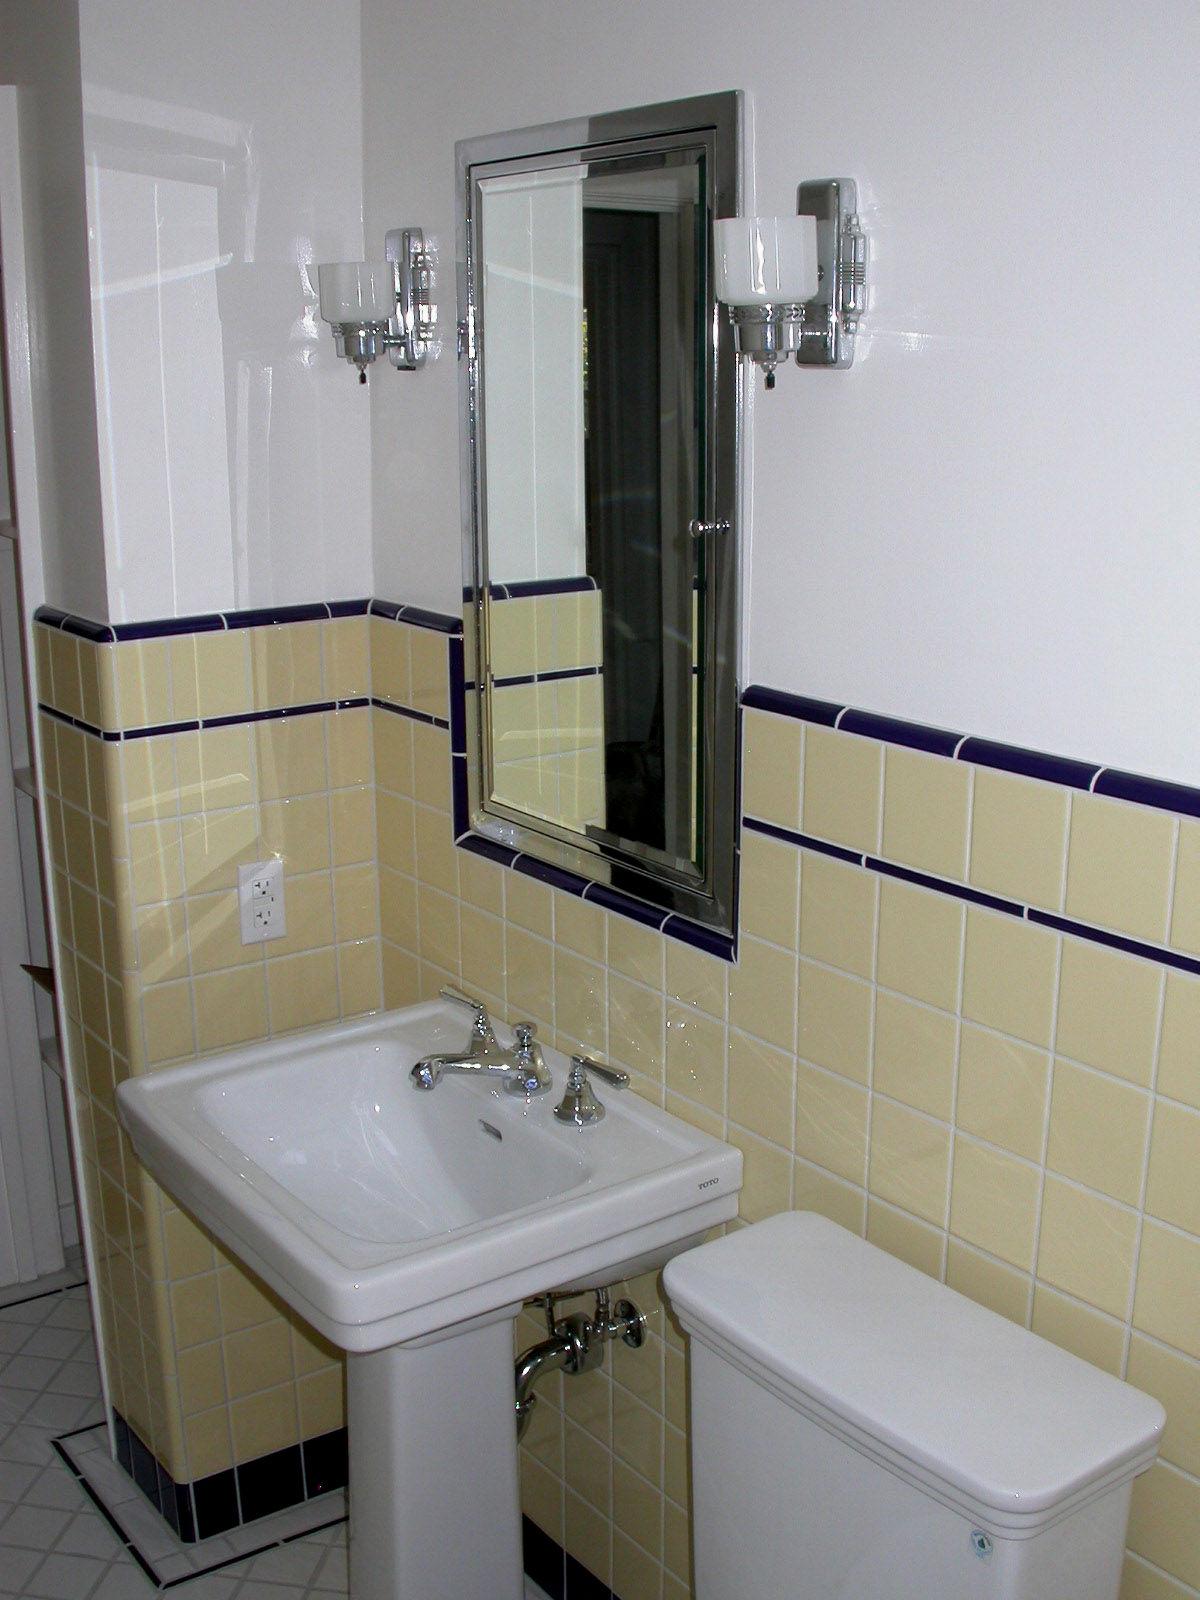 beautiful best flooring for bathroom construction-Unique Best Flooring for Bathroom Décor